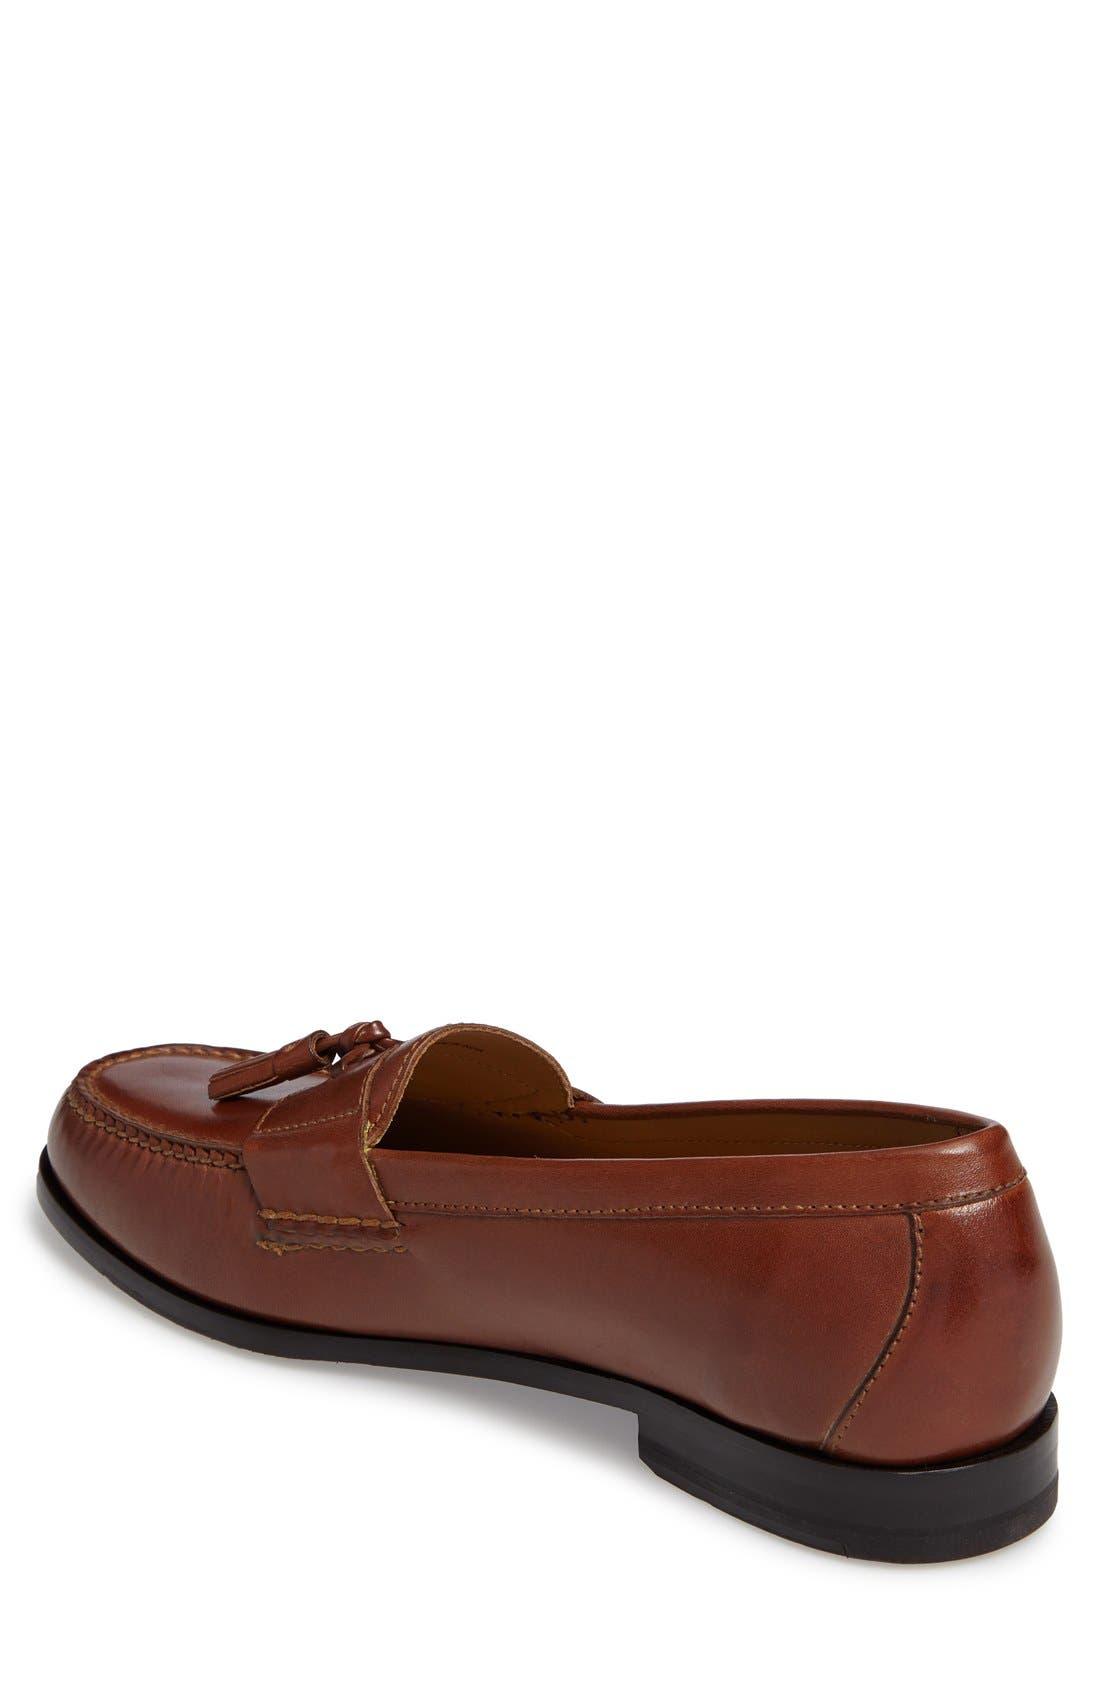 'Pinch Grand' Tassel Loafer,                             Alternate thumbnail 2, color,                             Papaya Leather